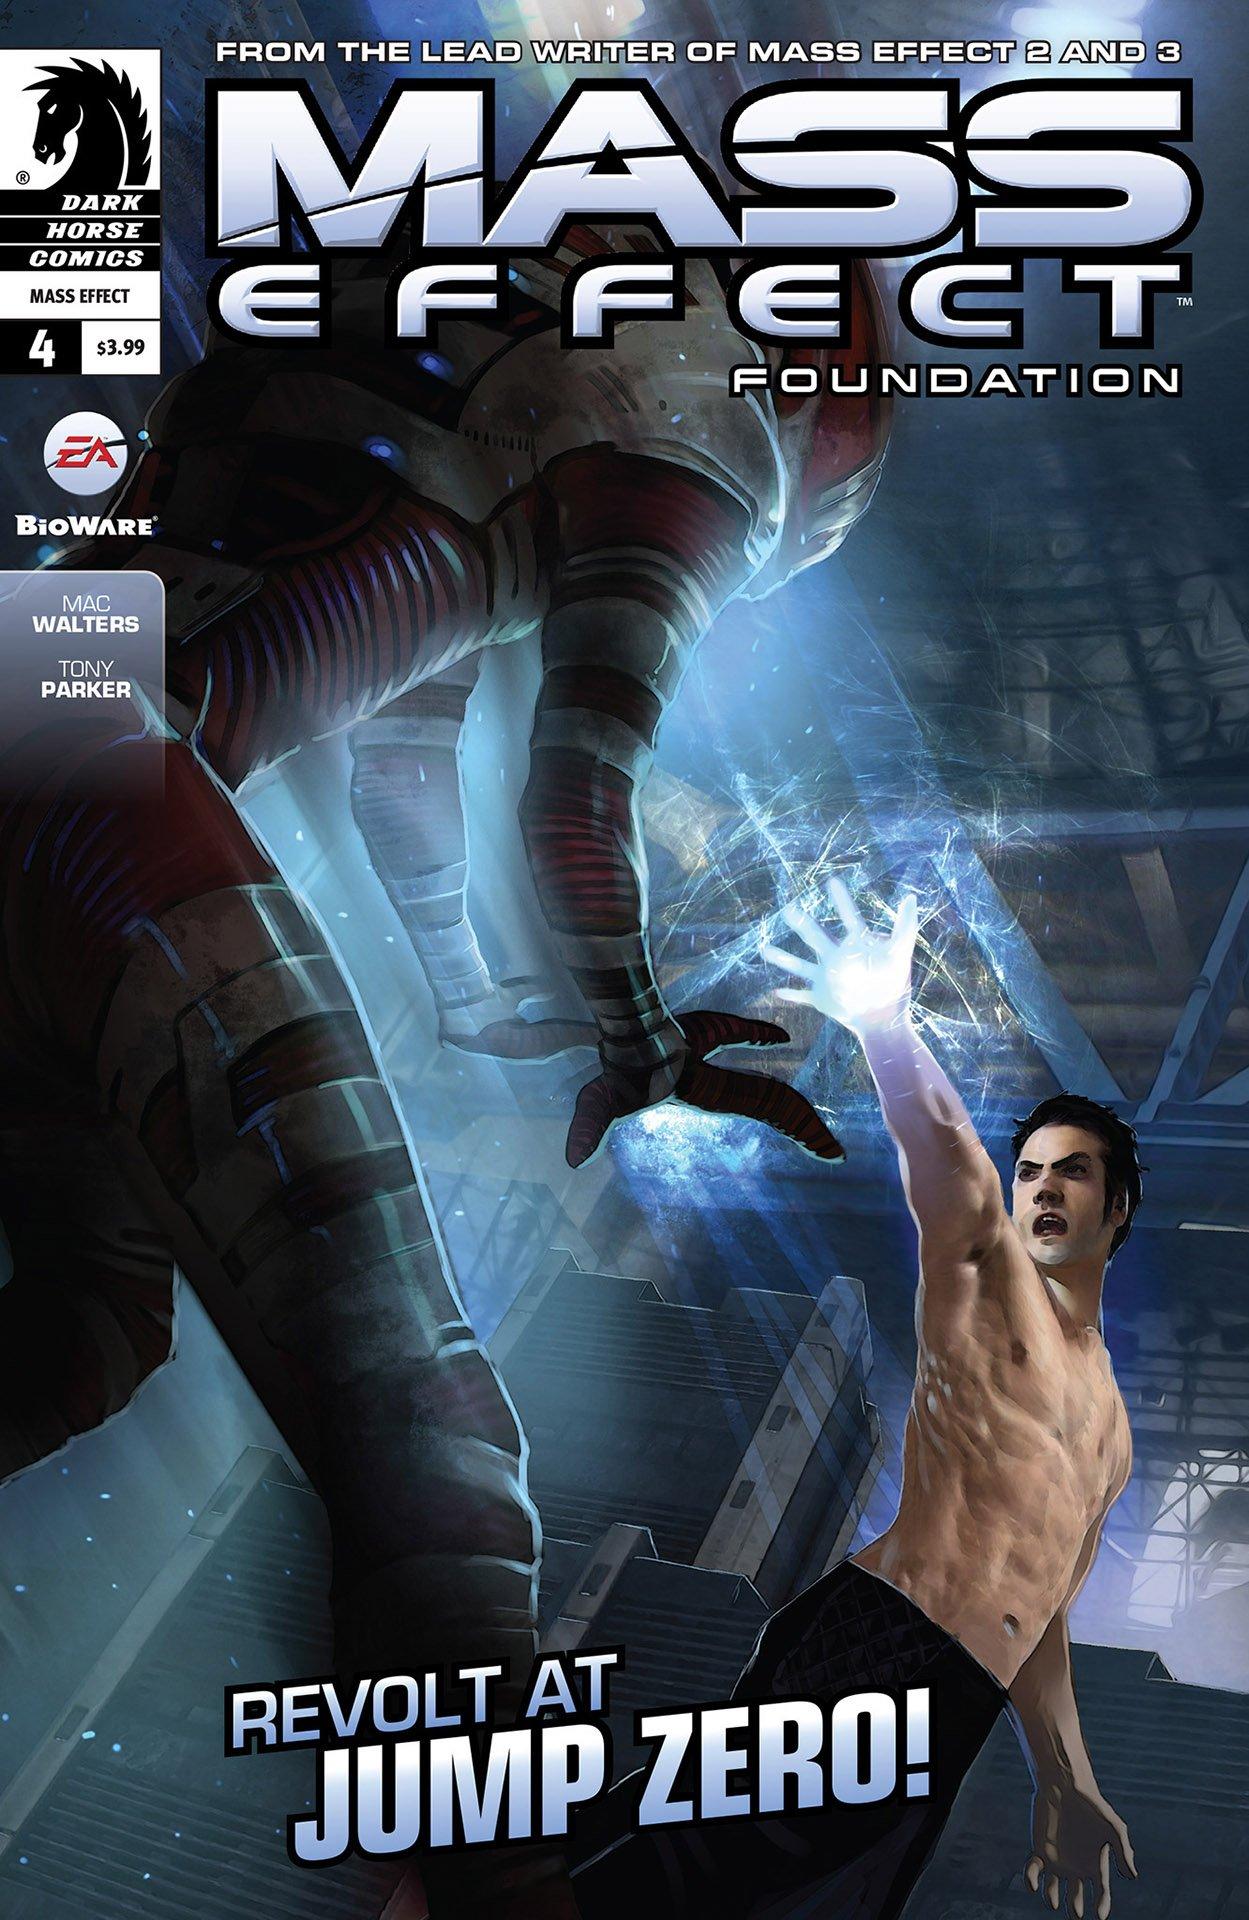 Mass Effect - Foundation 004 (October 2013)